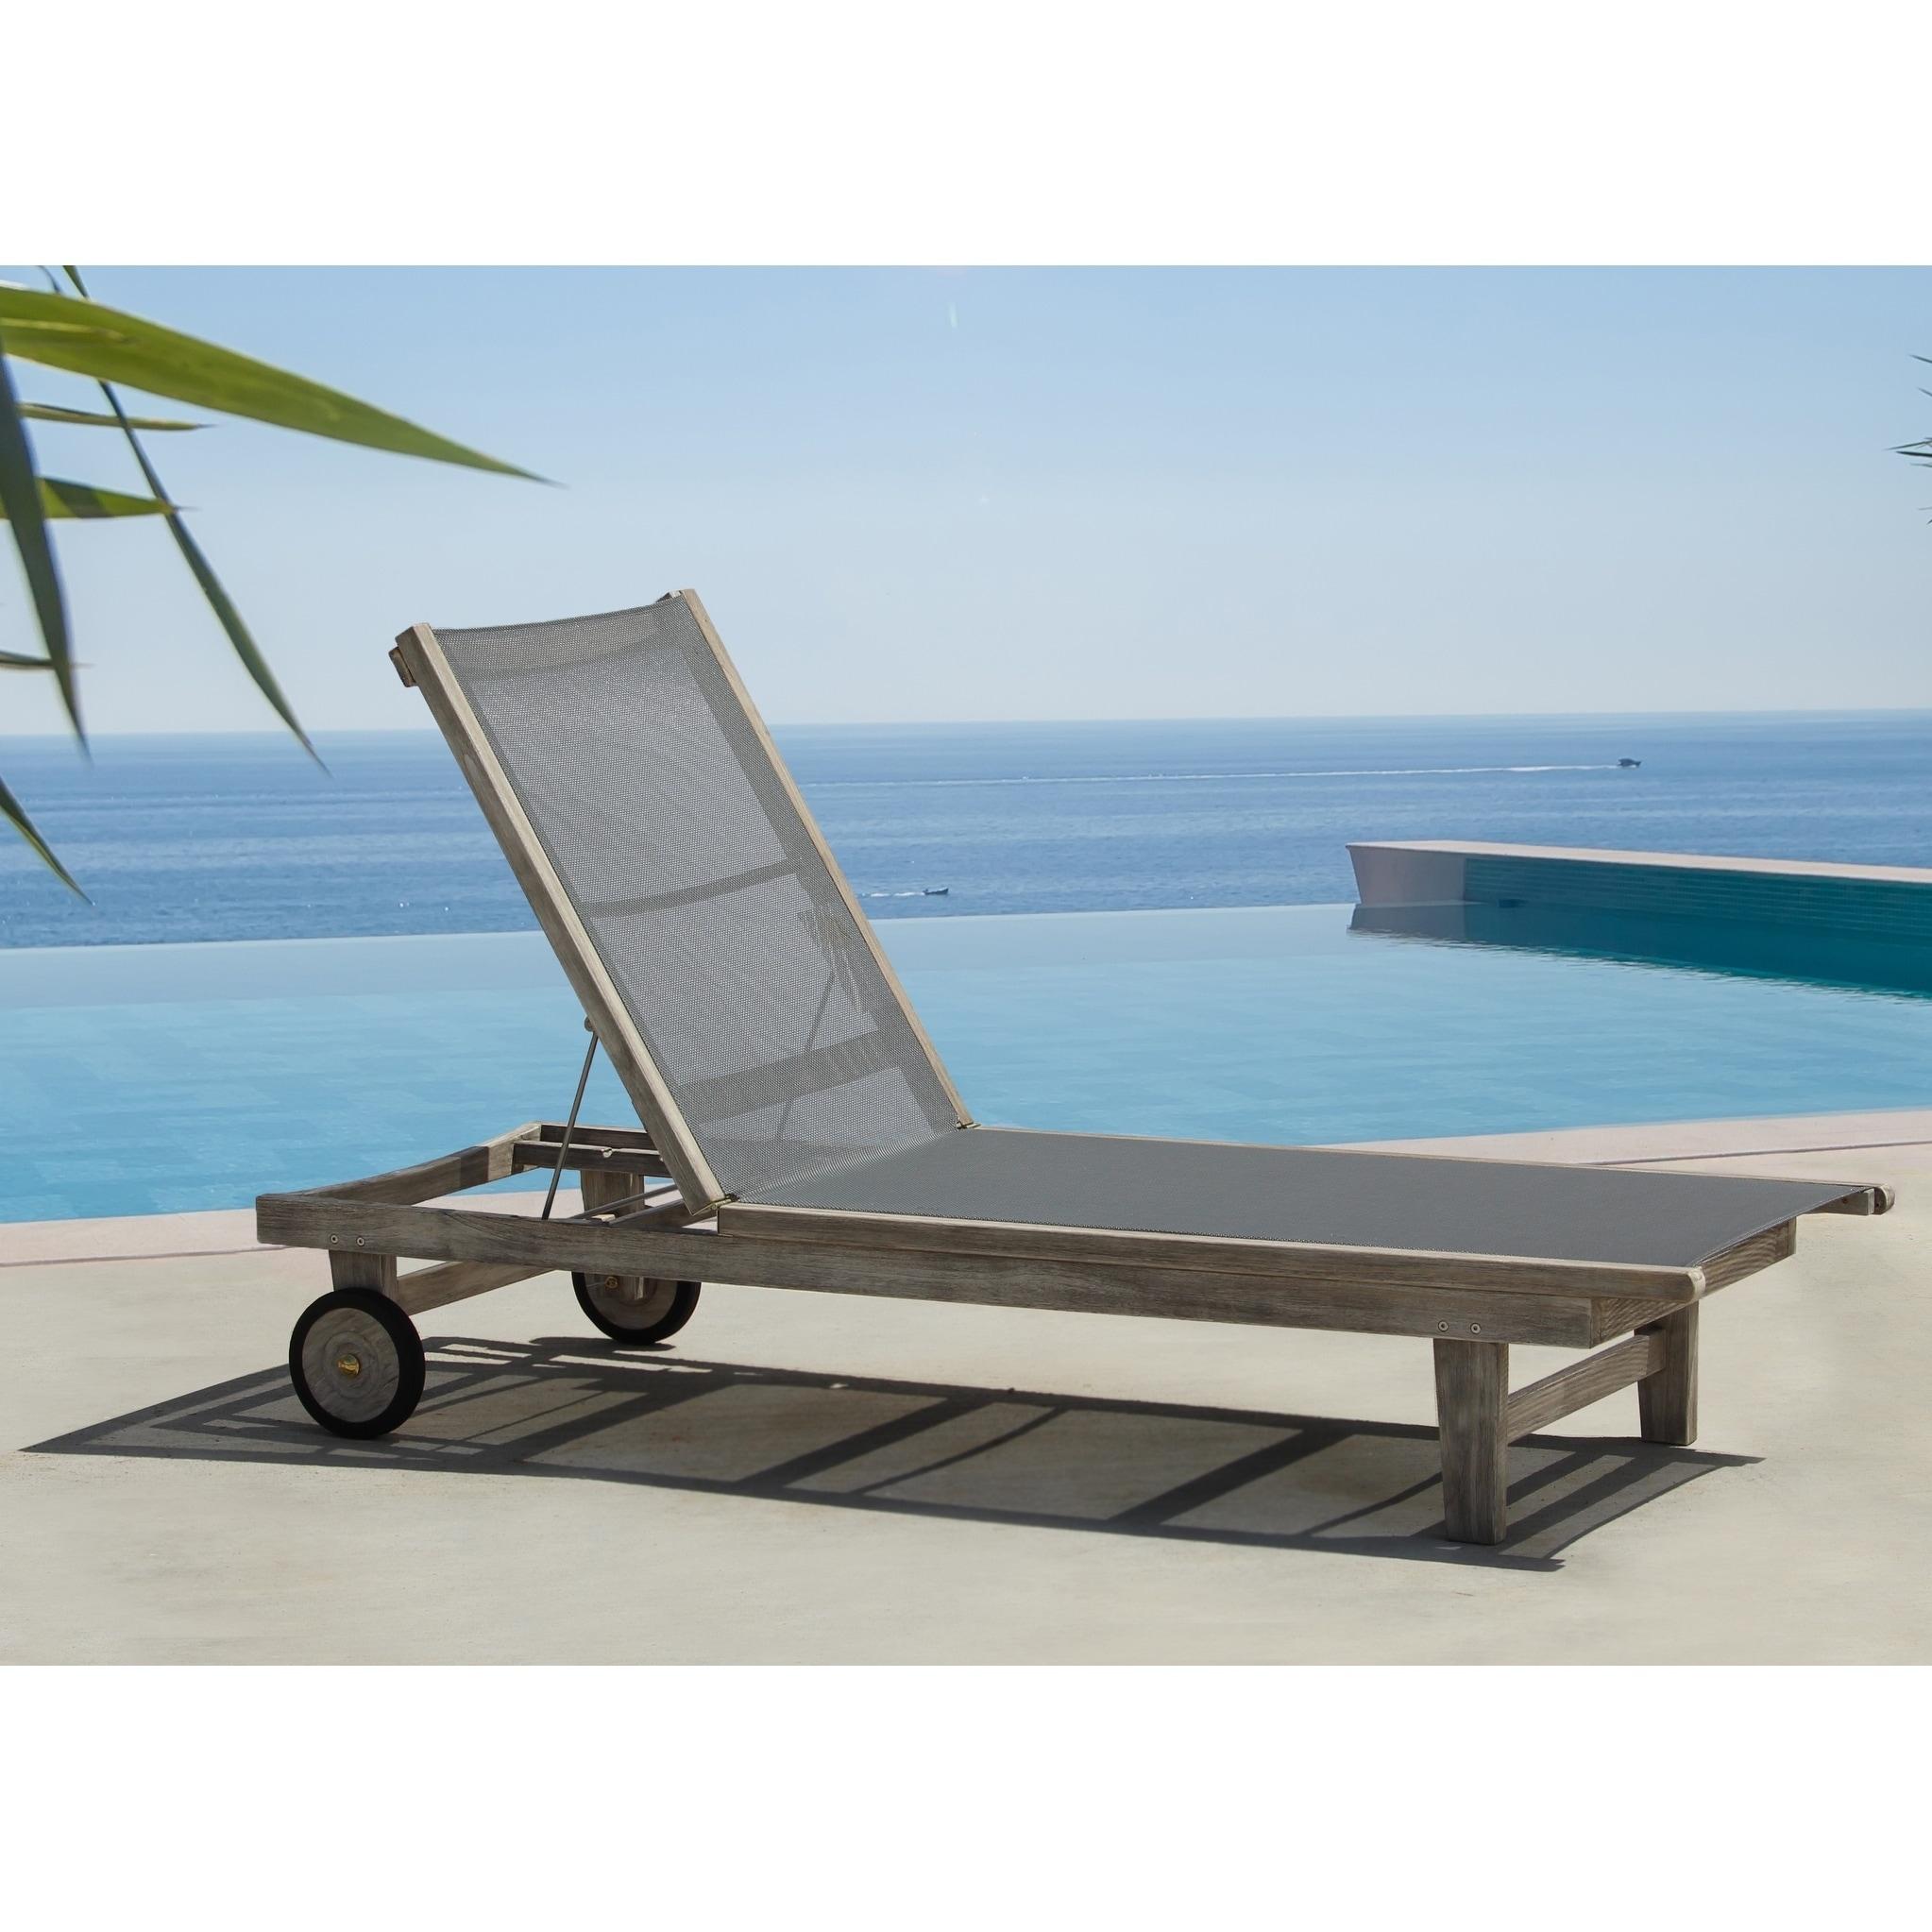 stylish cupboard lounge furniture chair fresh tile modern gro of grosartig design patio outdoor artig mobel